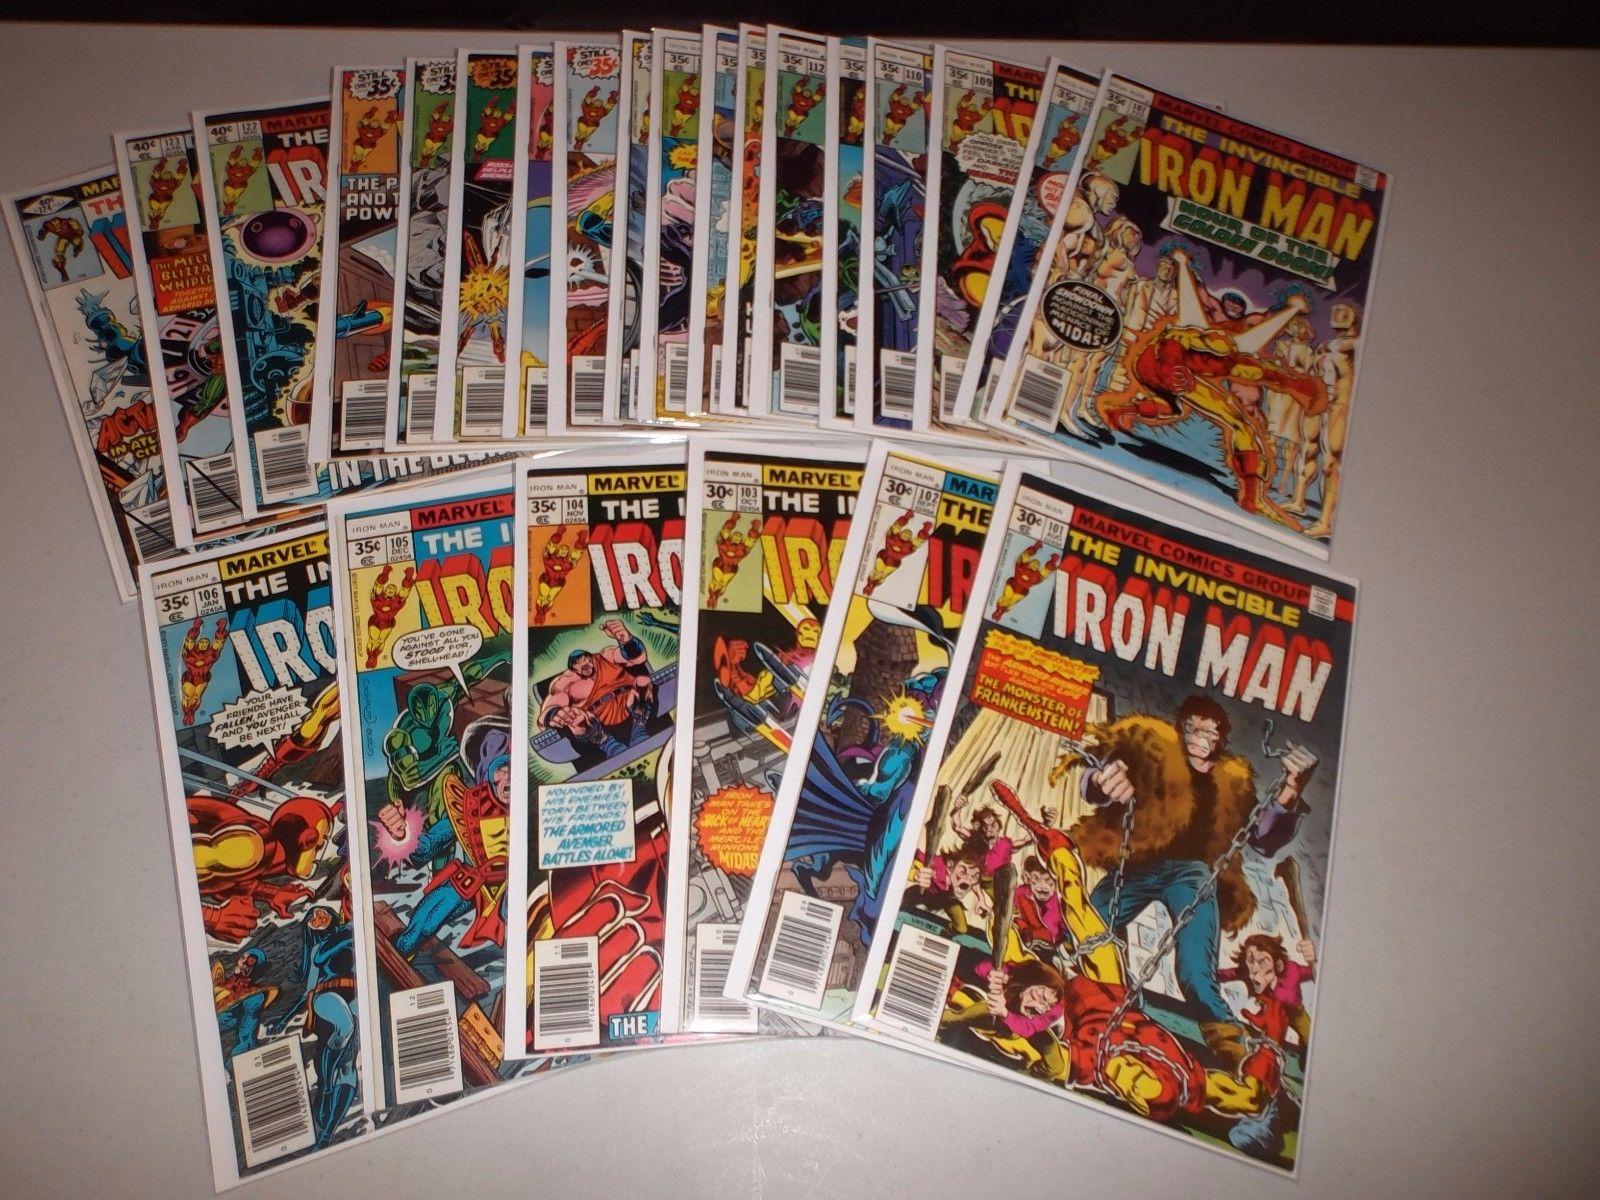 Iron Man #101-124 (Complete run of 24) 118 1st Jim Rhodes, 105 106 116 119 120